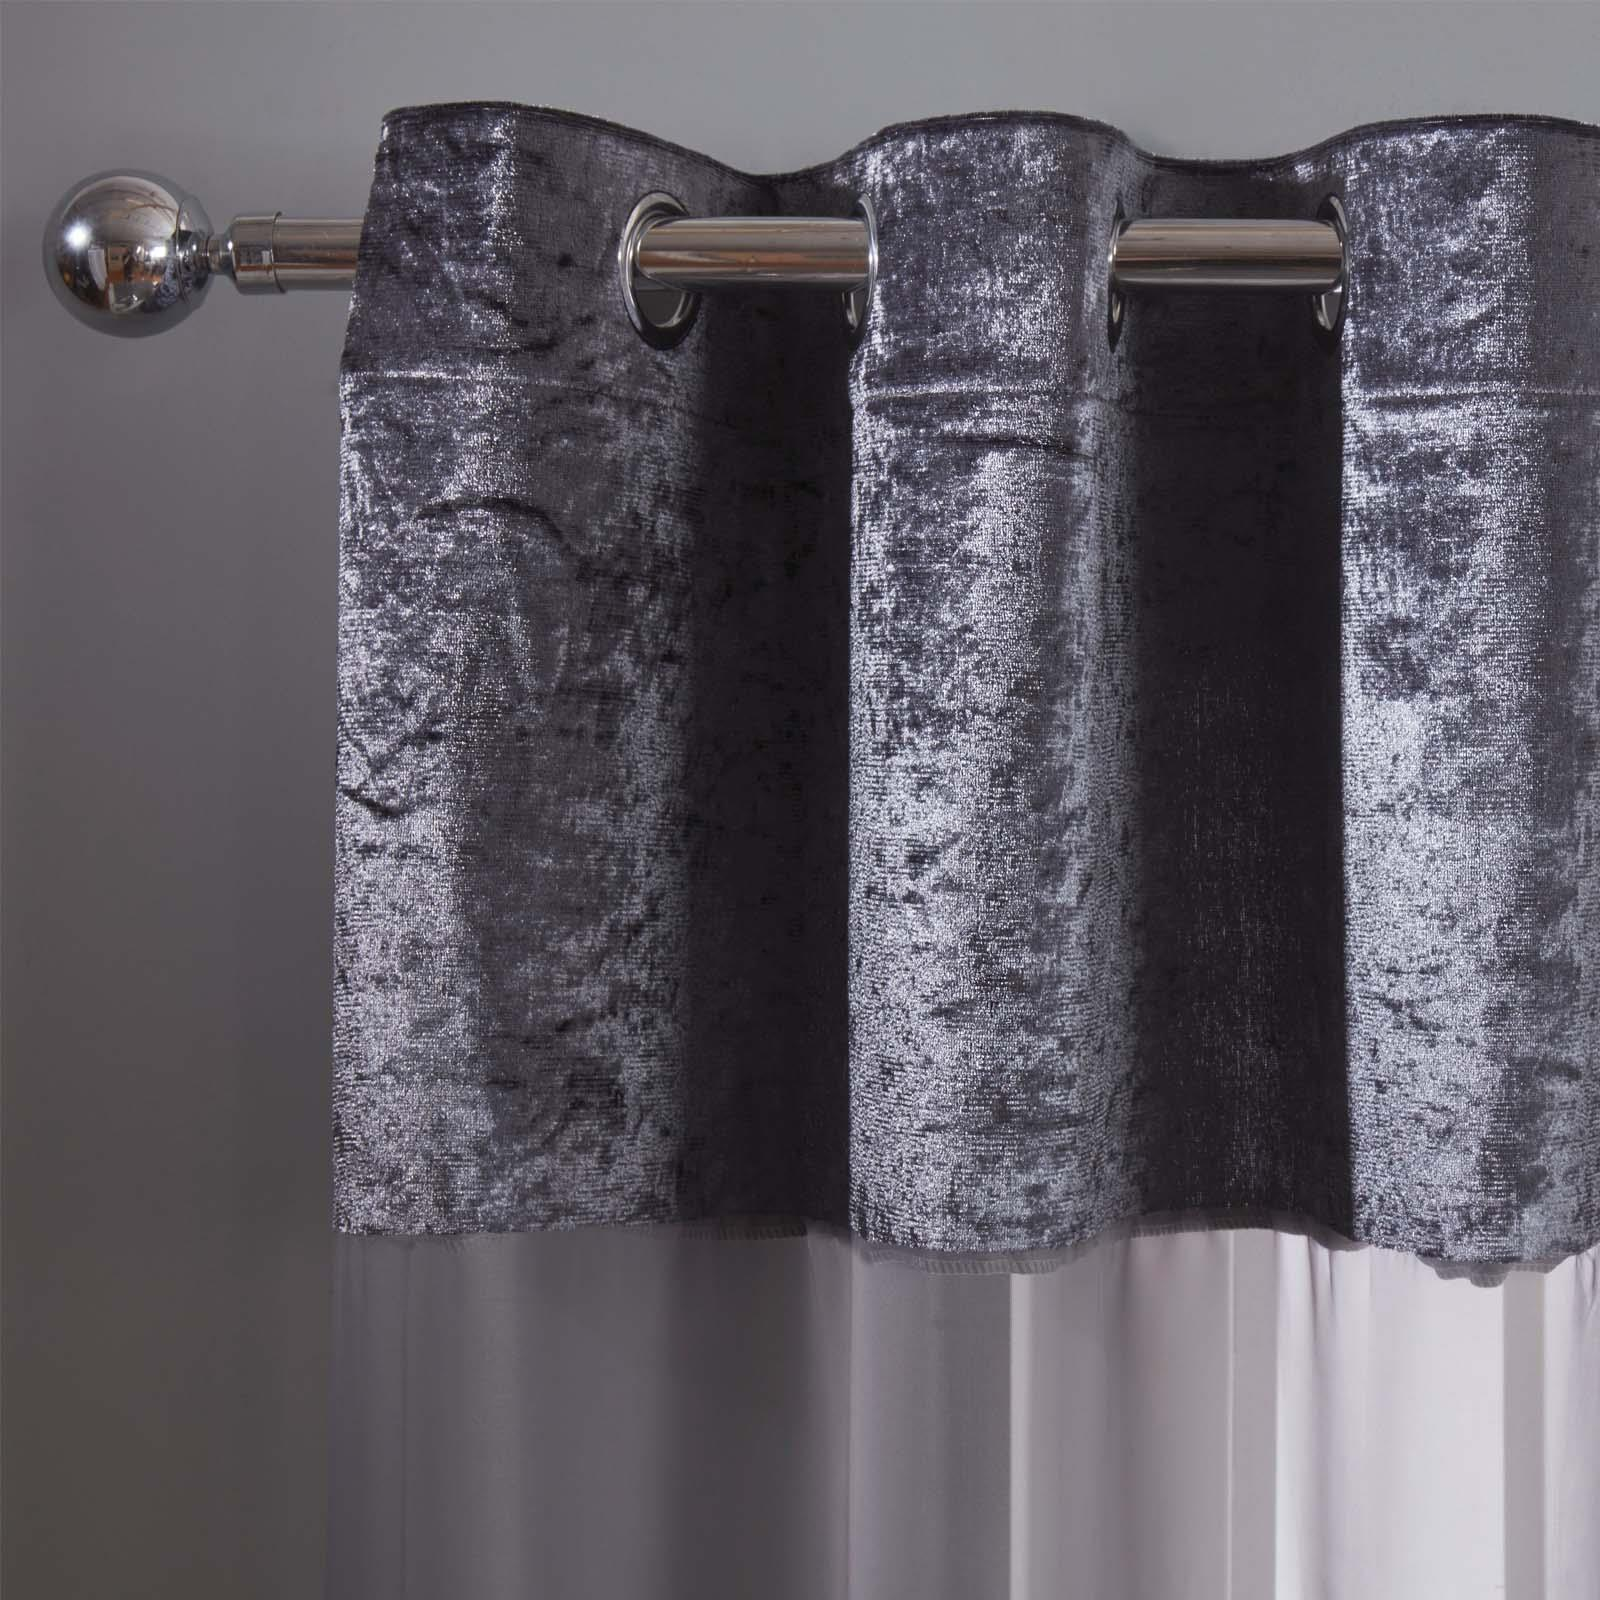 Sienna-Crushed-Velvet-Voile-PAIR-of-Net-Eyelet-Ring-Top-Curtains-Blush-Silver thumbnail 10